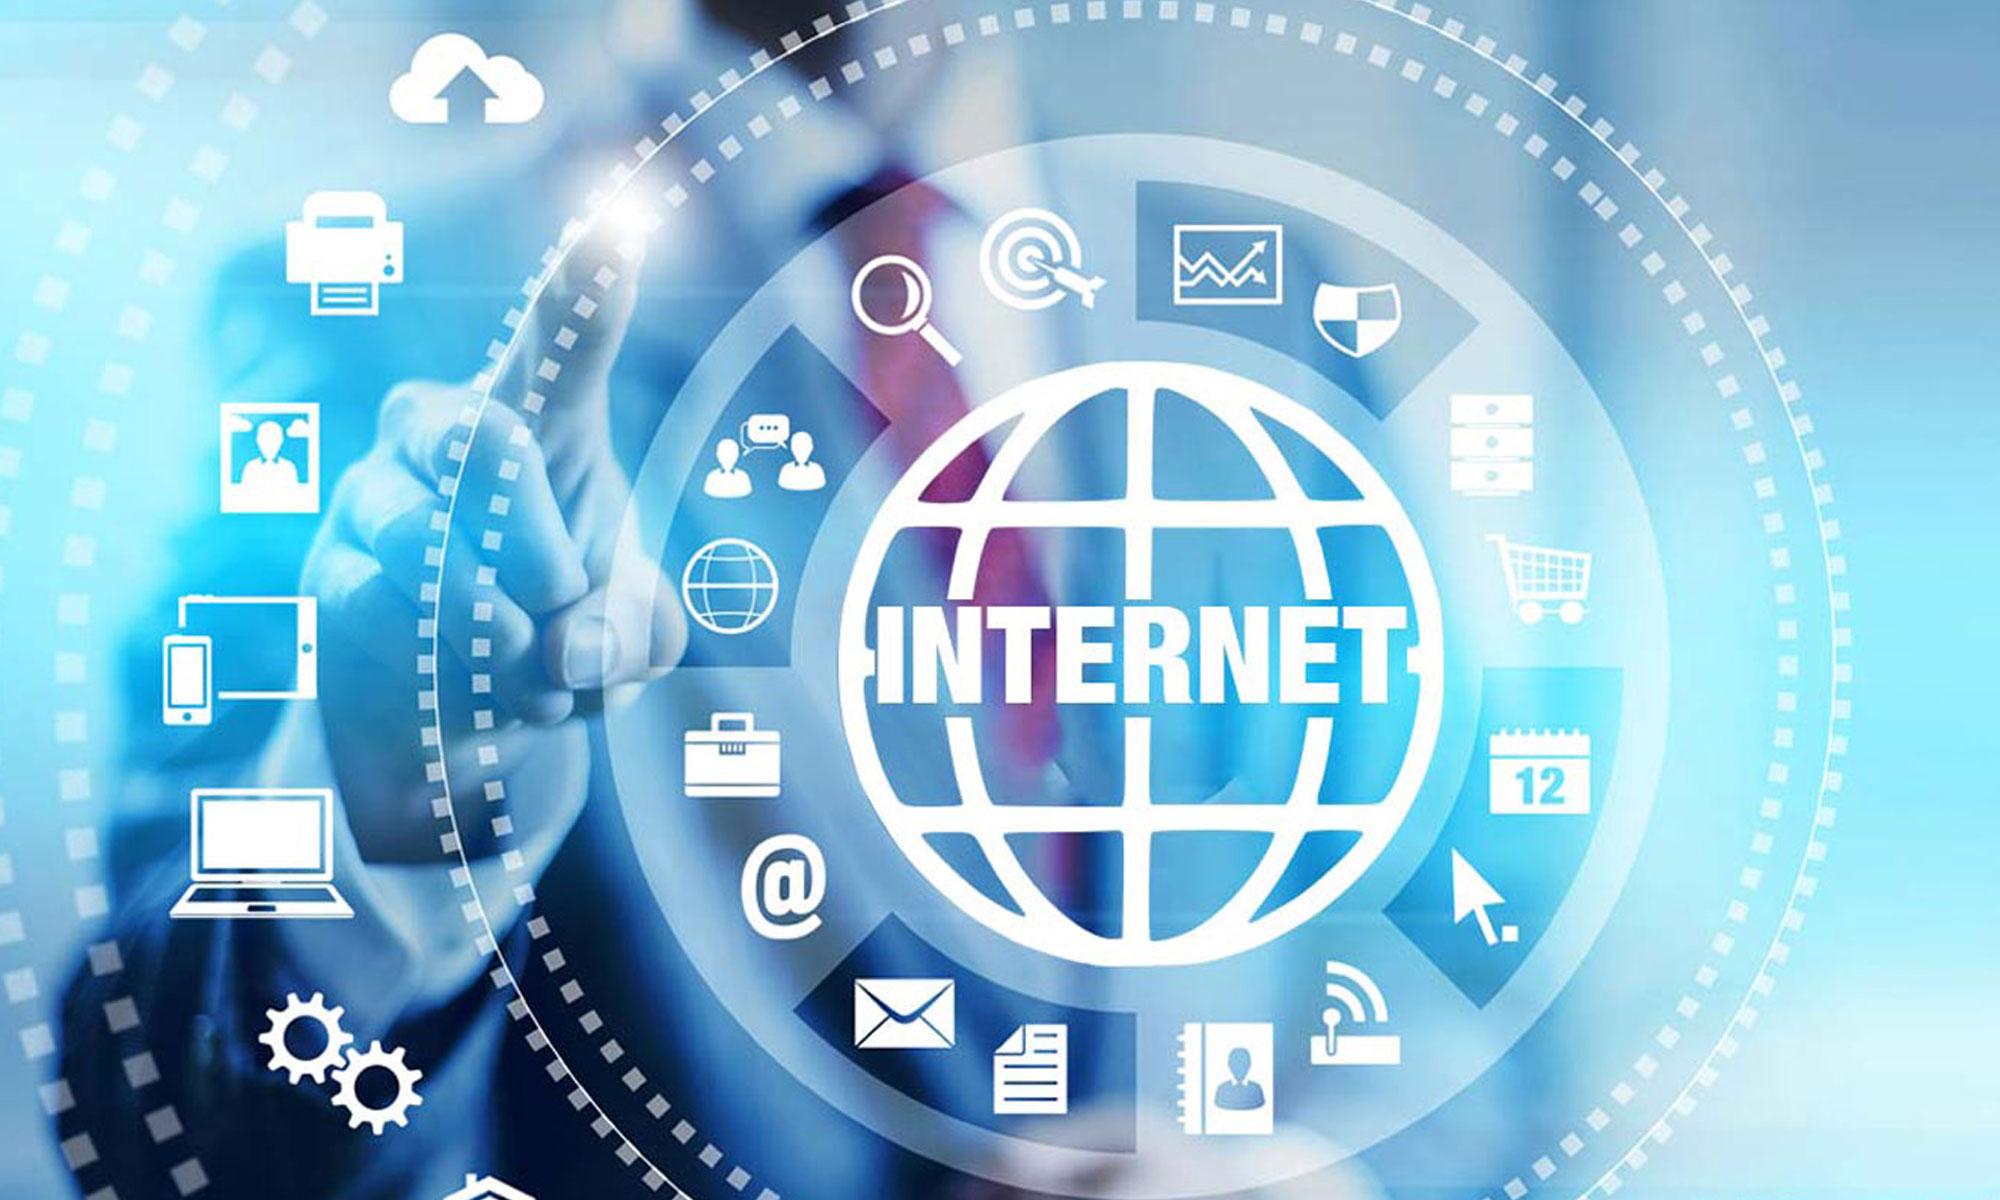 Как настроить интернет на МТС – настройки интернета МТС